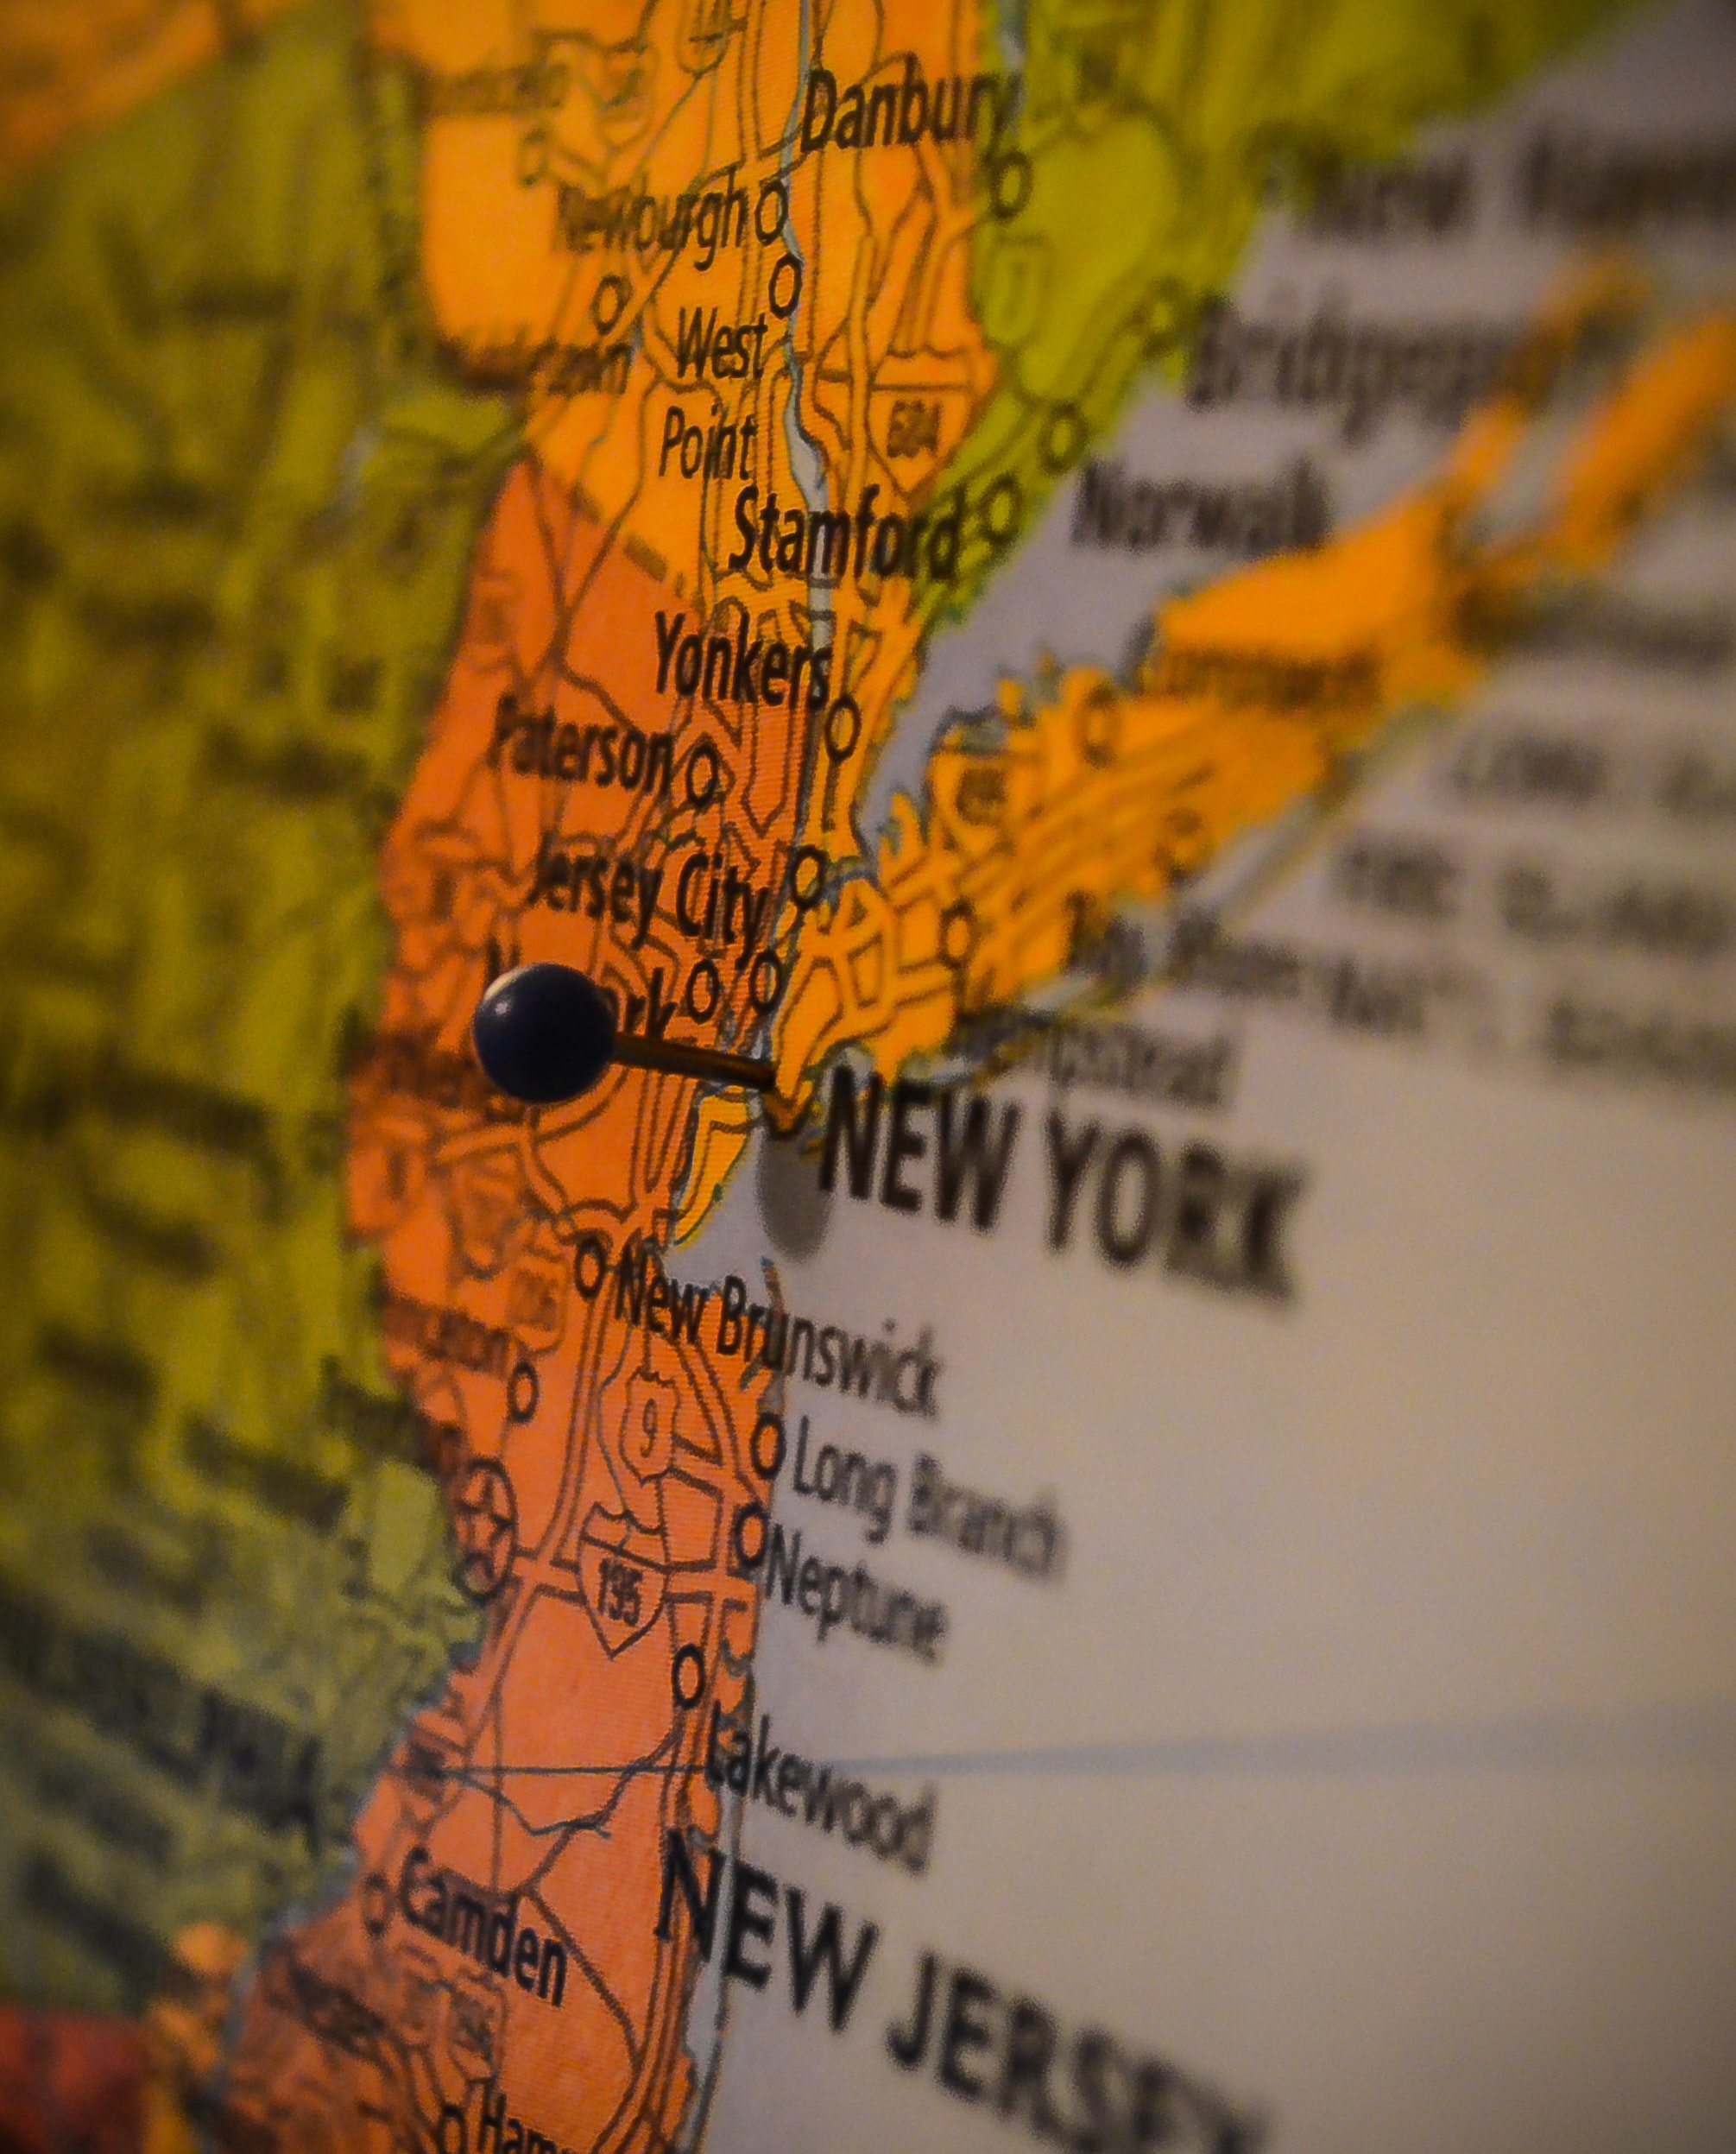 closeup photo of New York map